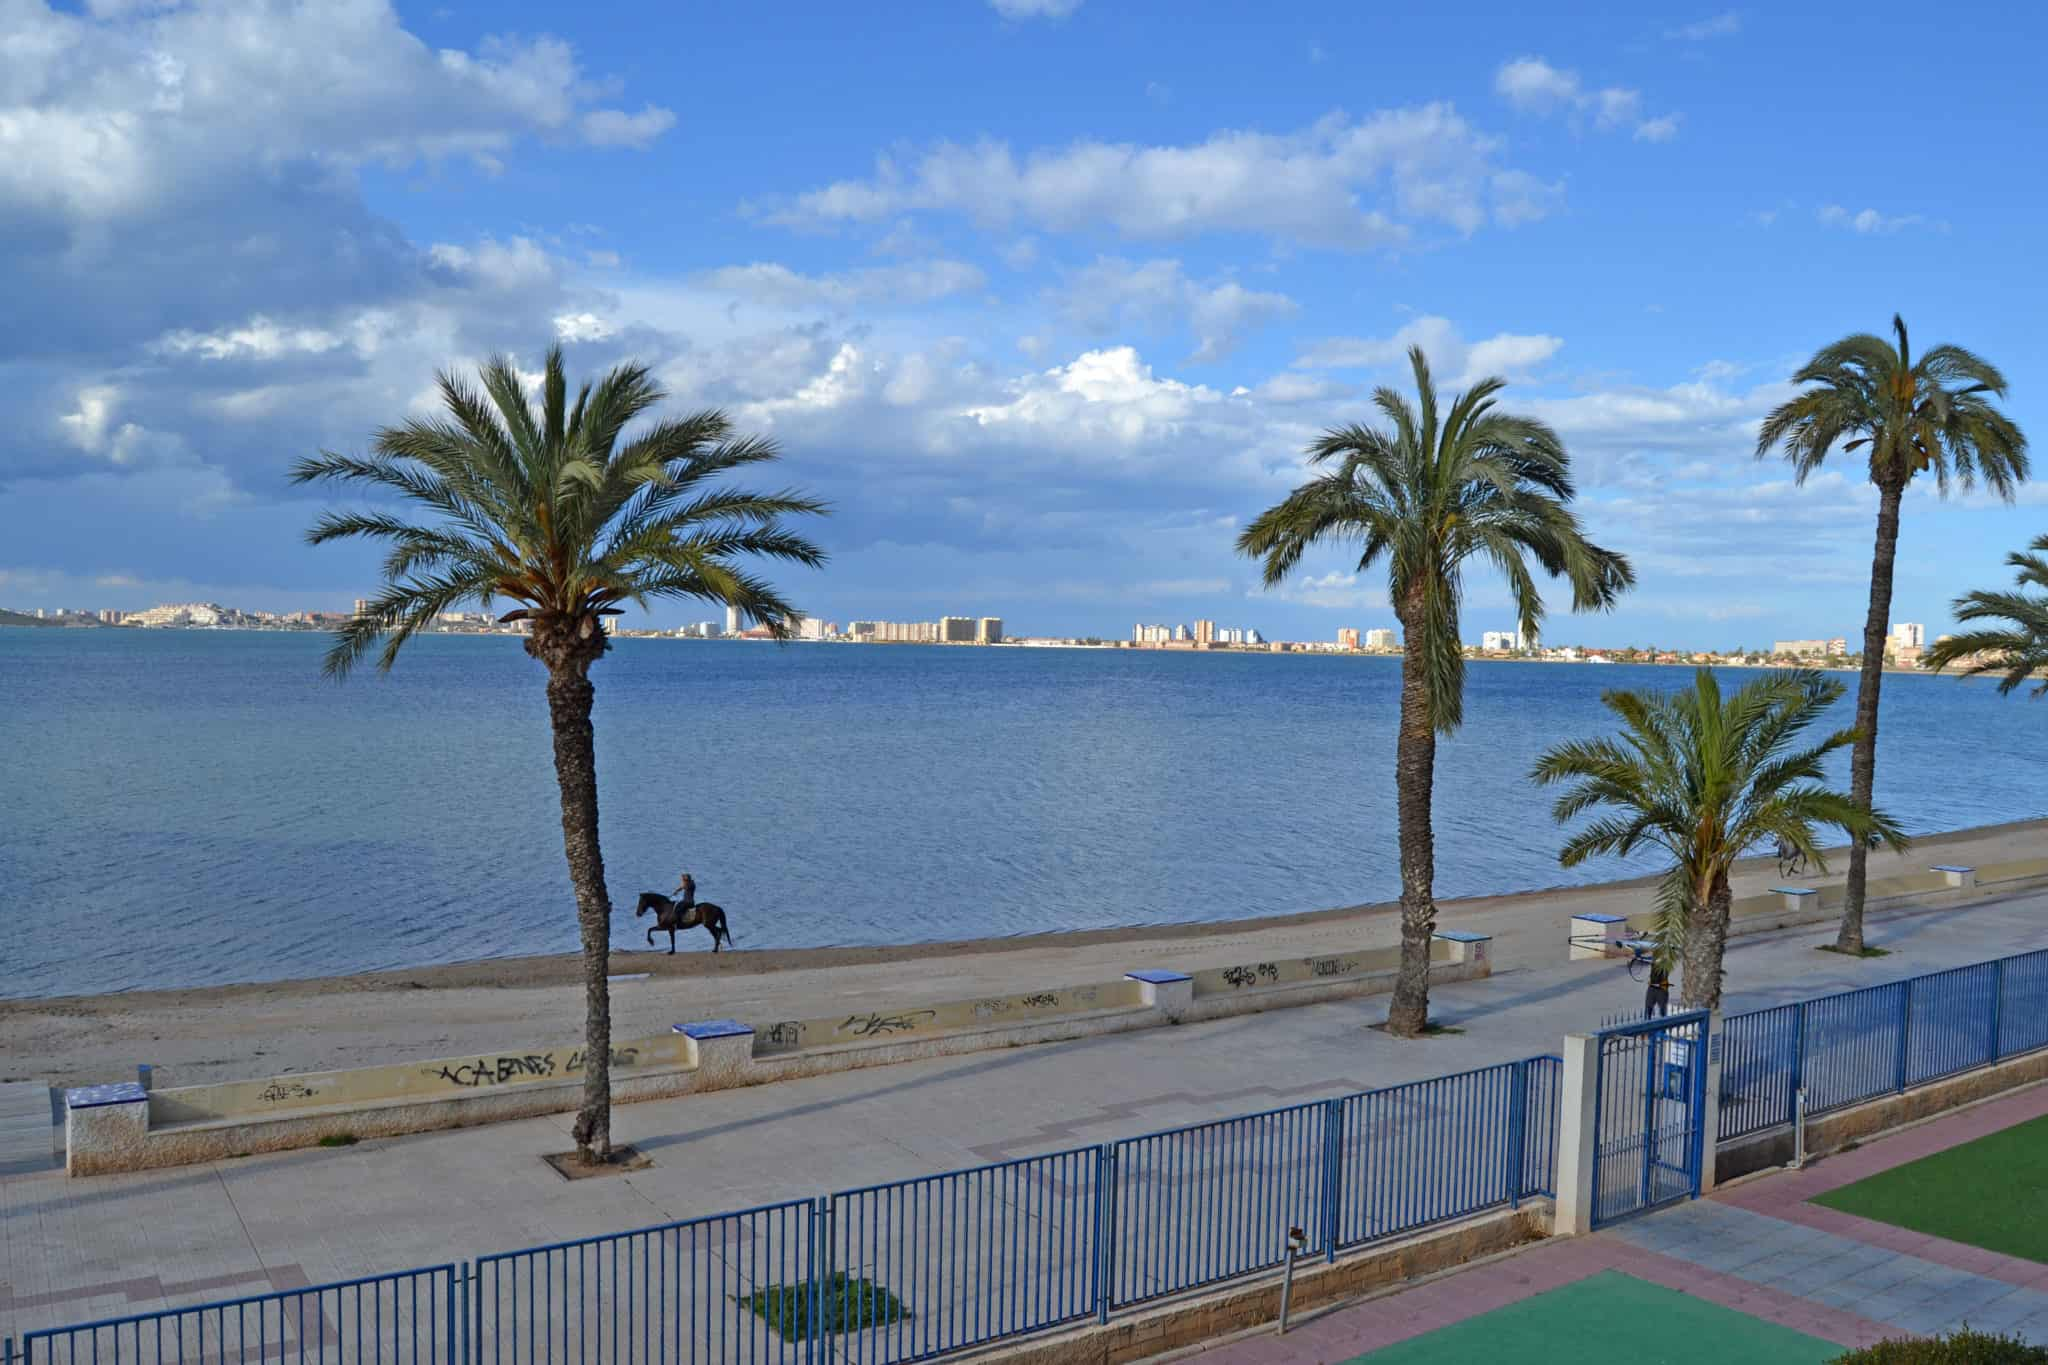 Horse riding in Playa Honda, by the Mar Menor